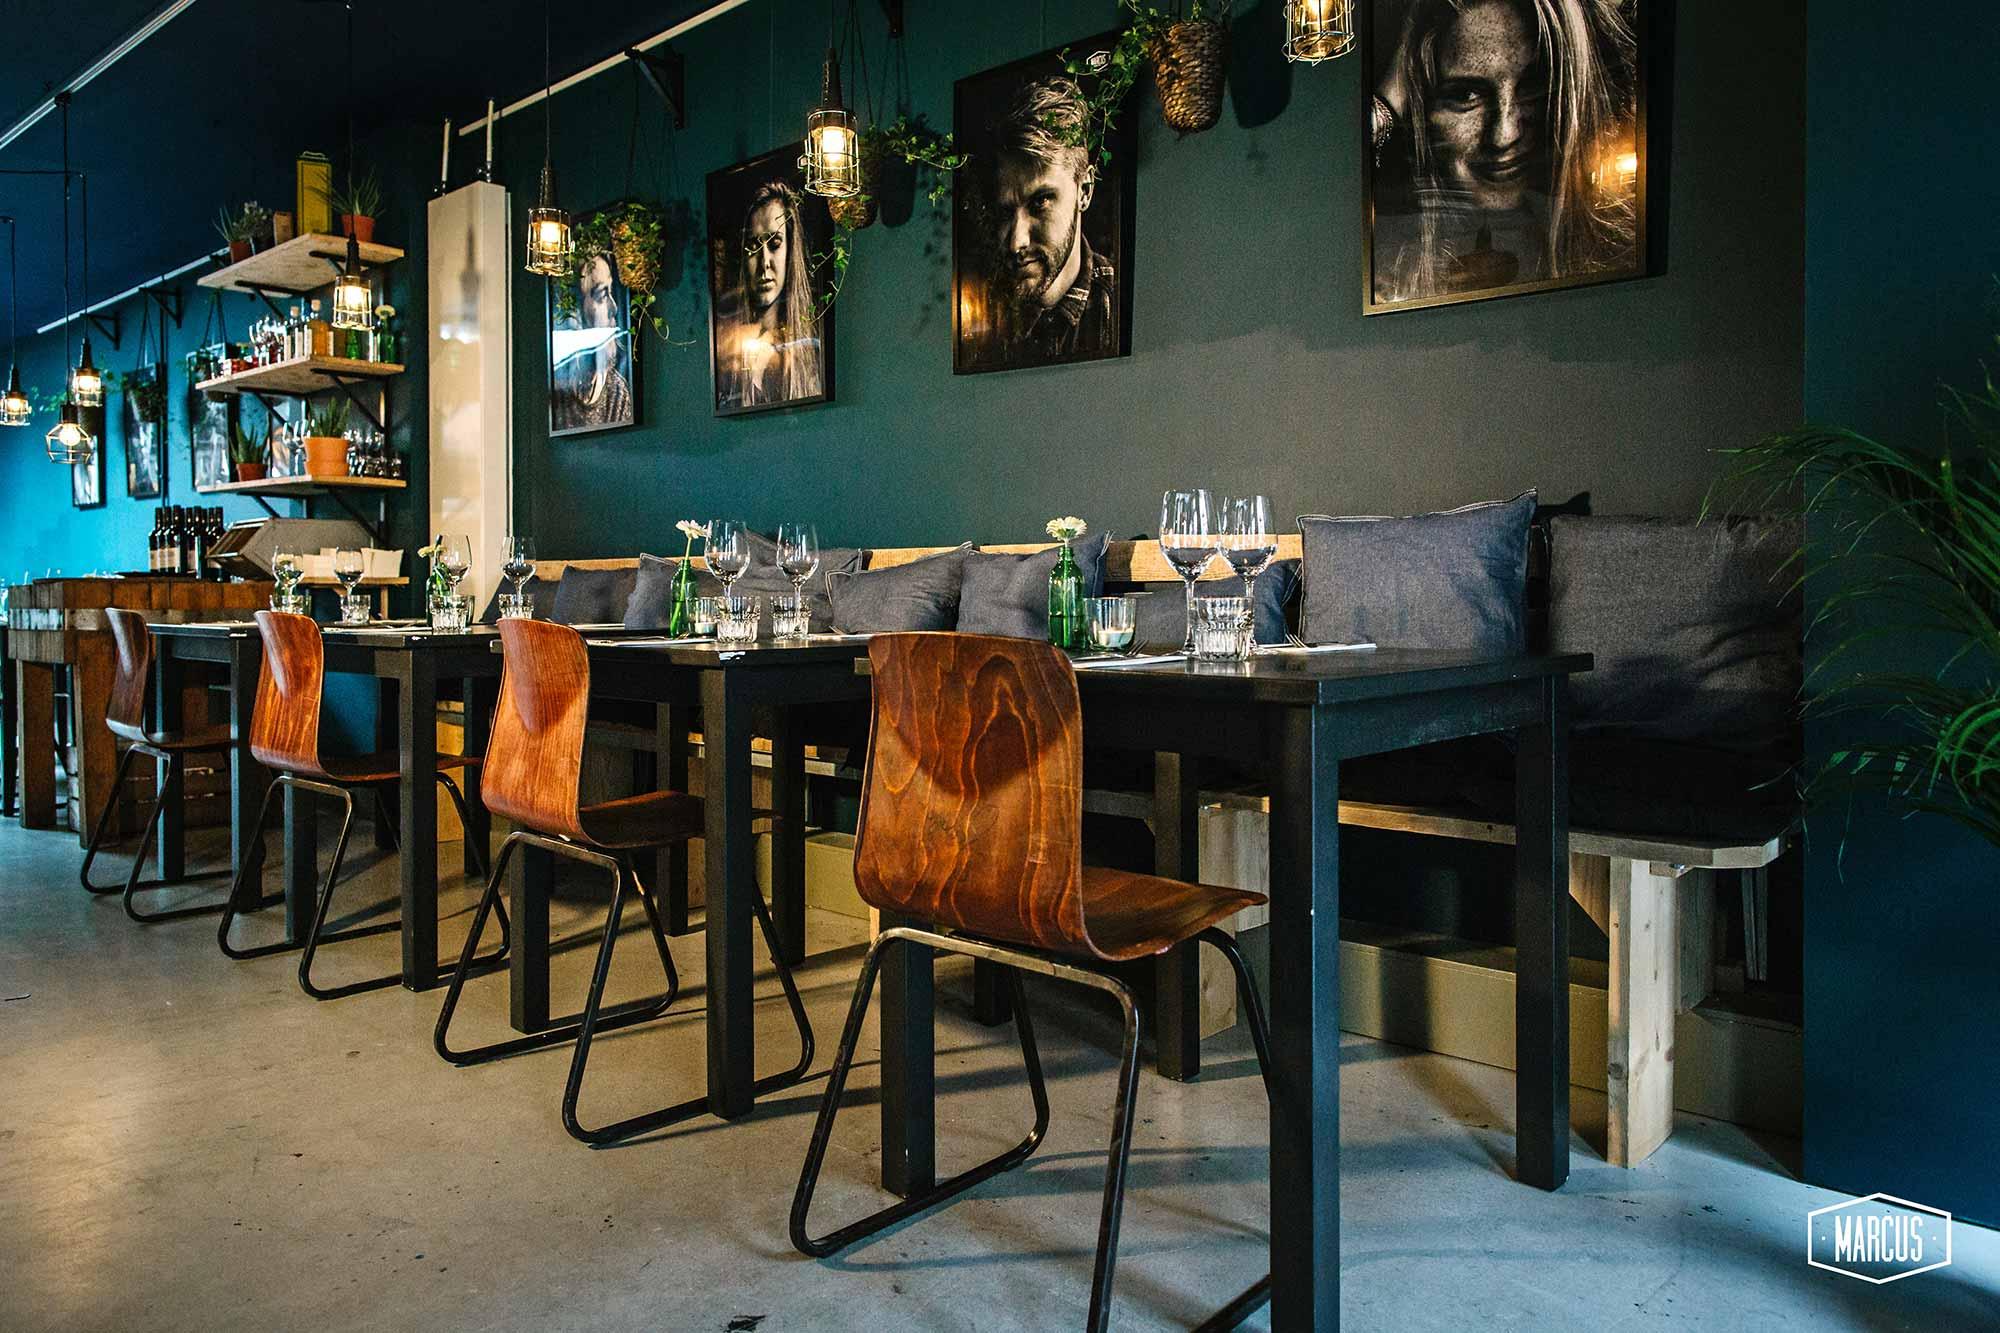 marcus restaurant hotspot